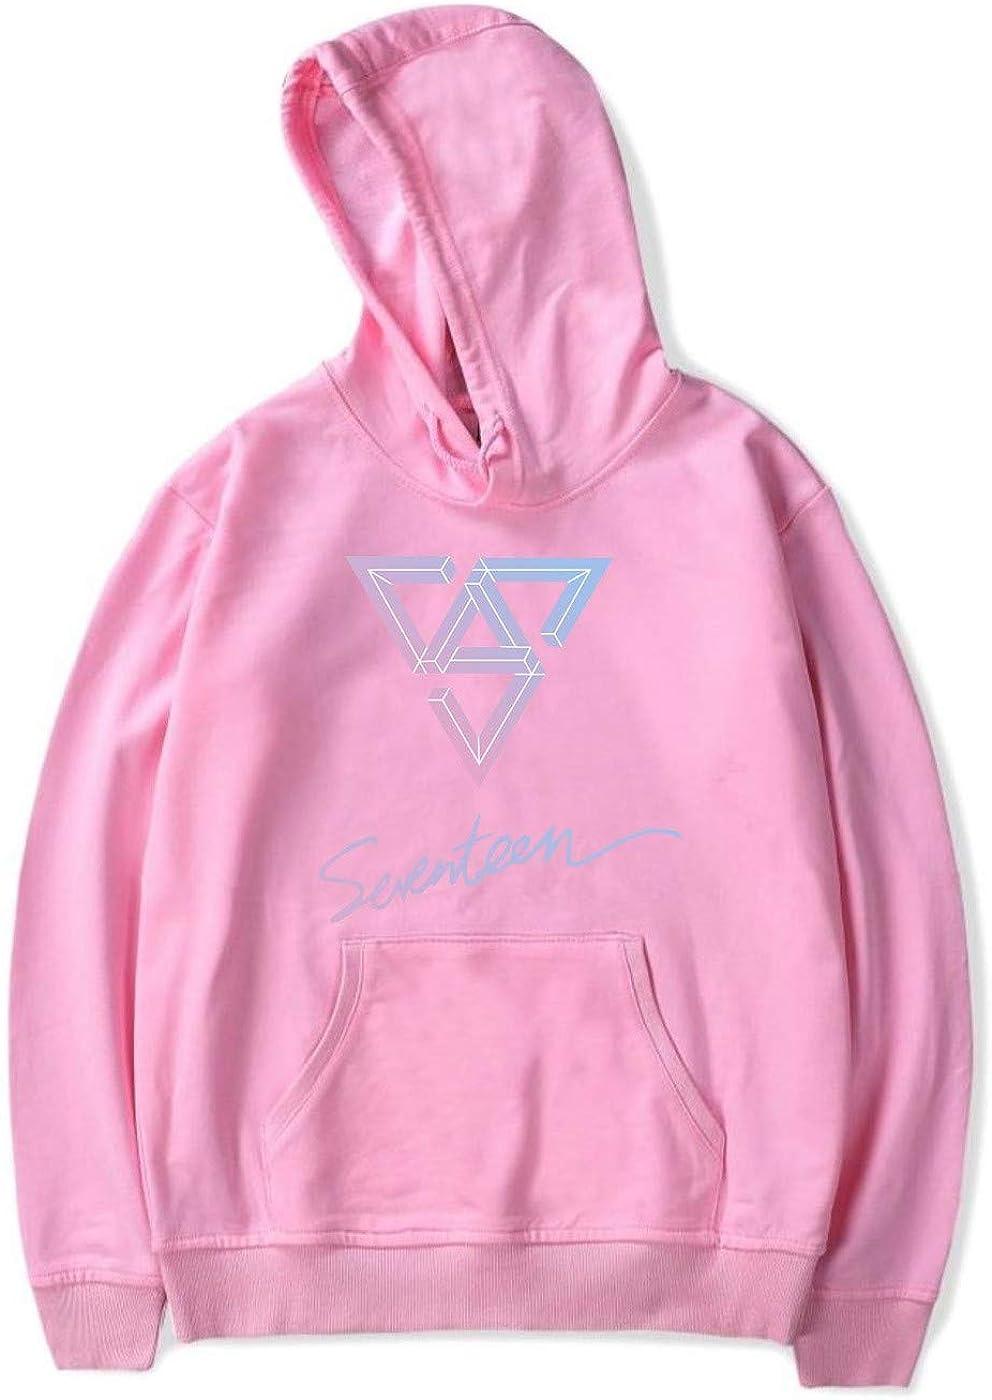 SERAPHY Unisex Seventeen Hoodie 17 Kpop Pullover Hooded Sweatshirt Autumn Winter Long Sleeve Top